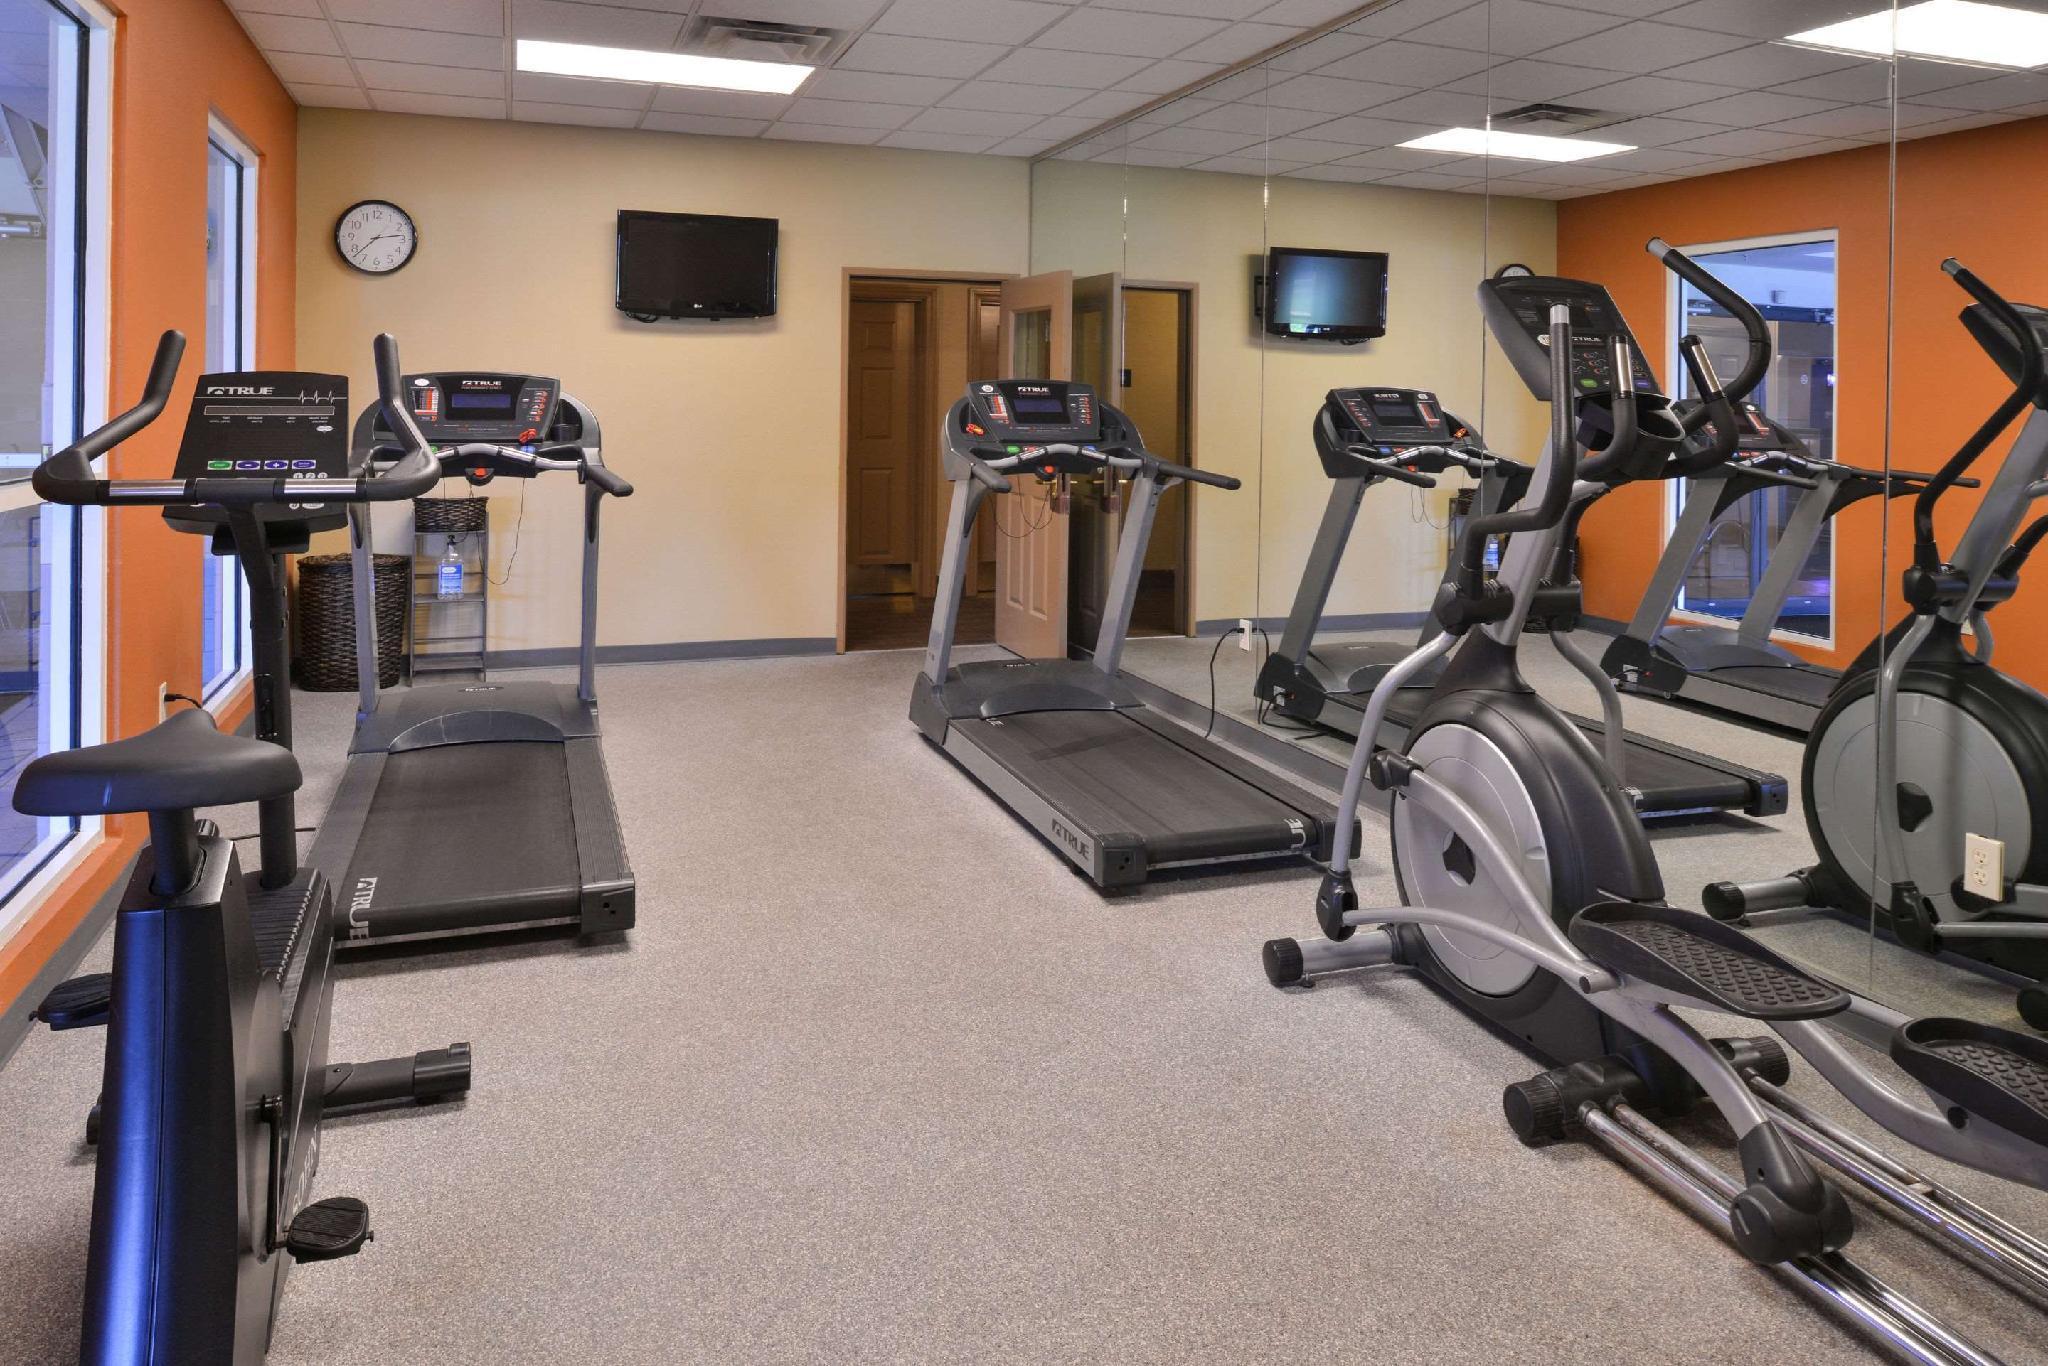 Review Comfort Inn & Suites Fayetteville